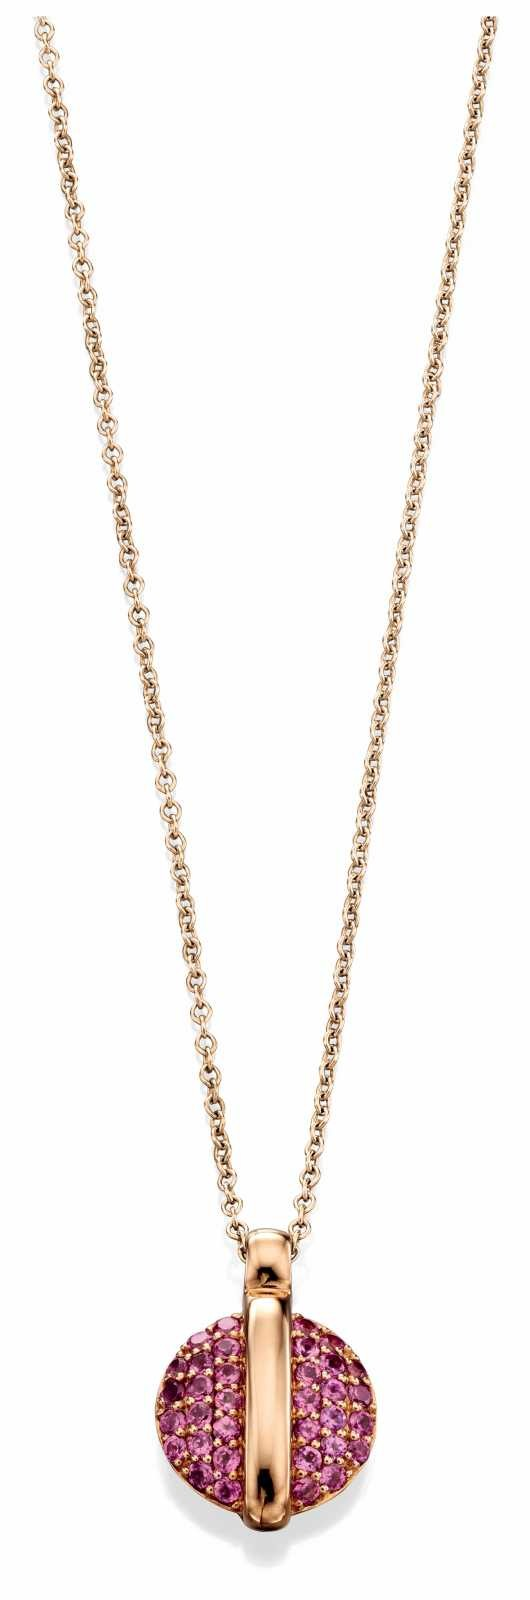 Fiorelli Gold 9k Rose Gold Rhodolite Garnet Pavé Disc Necklace GN252